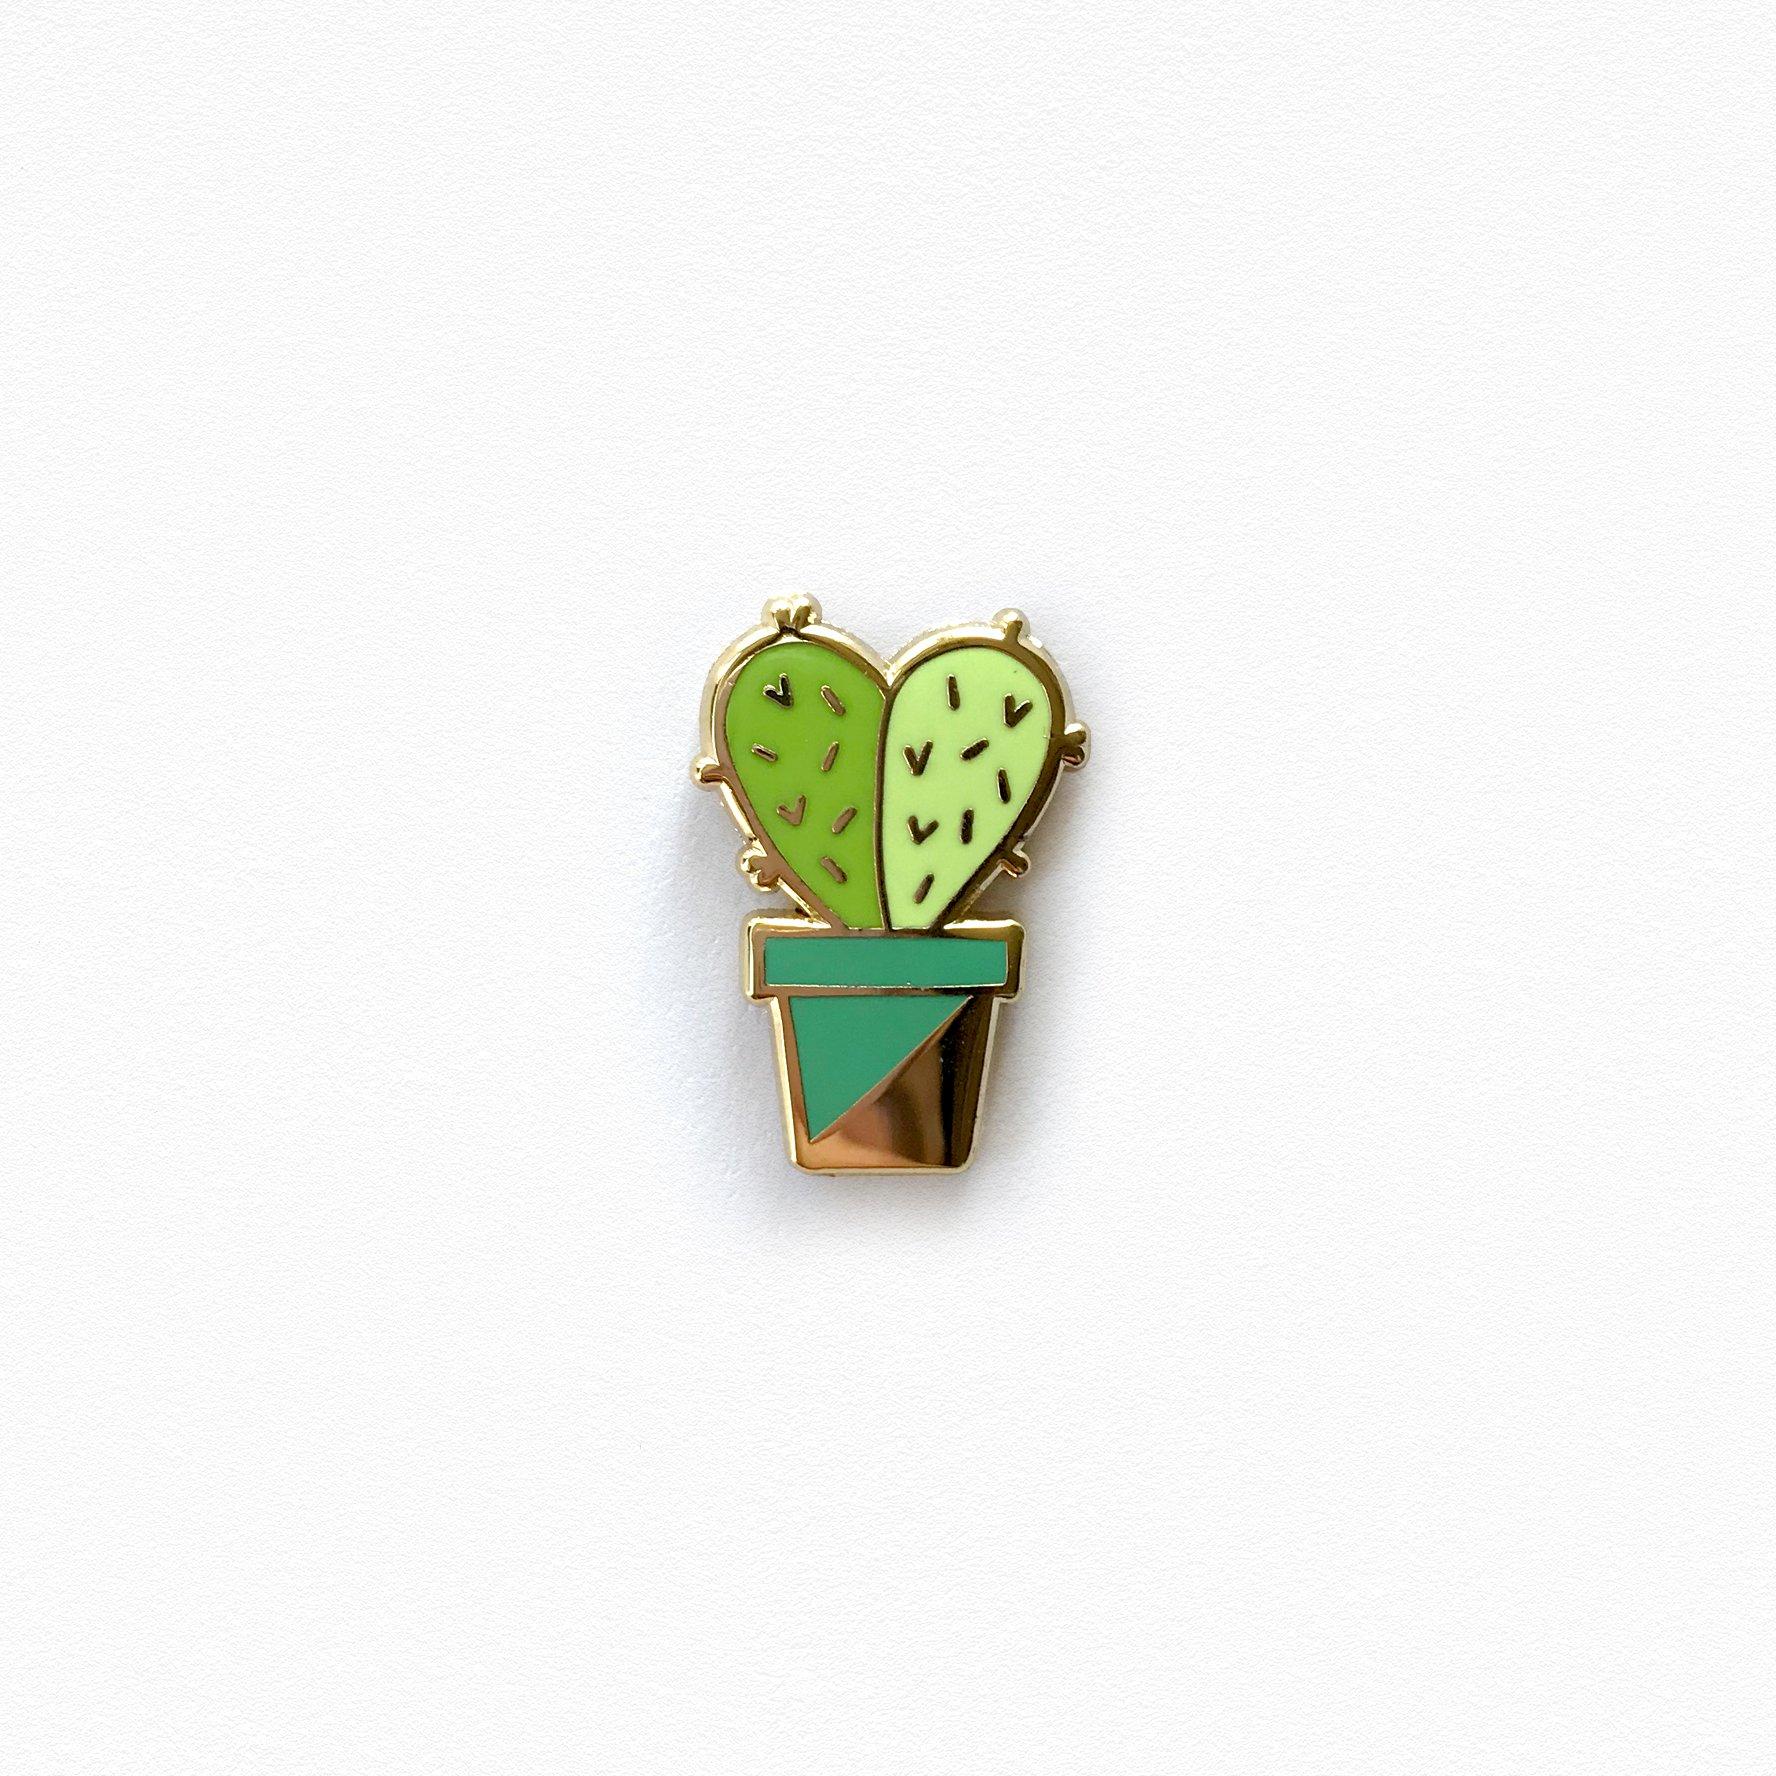 cactus_1024x1024@2x.jpg